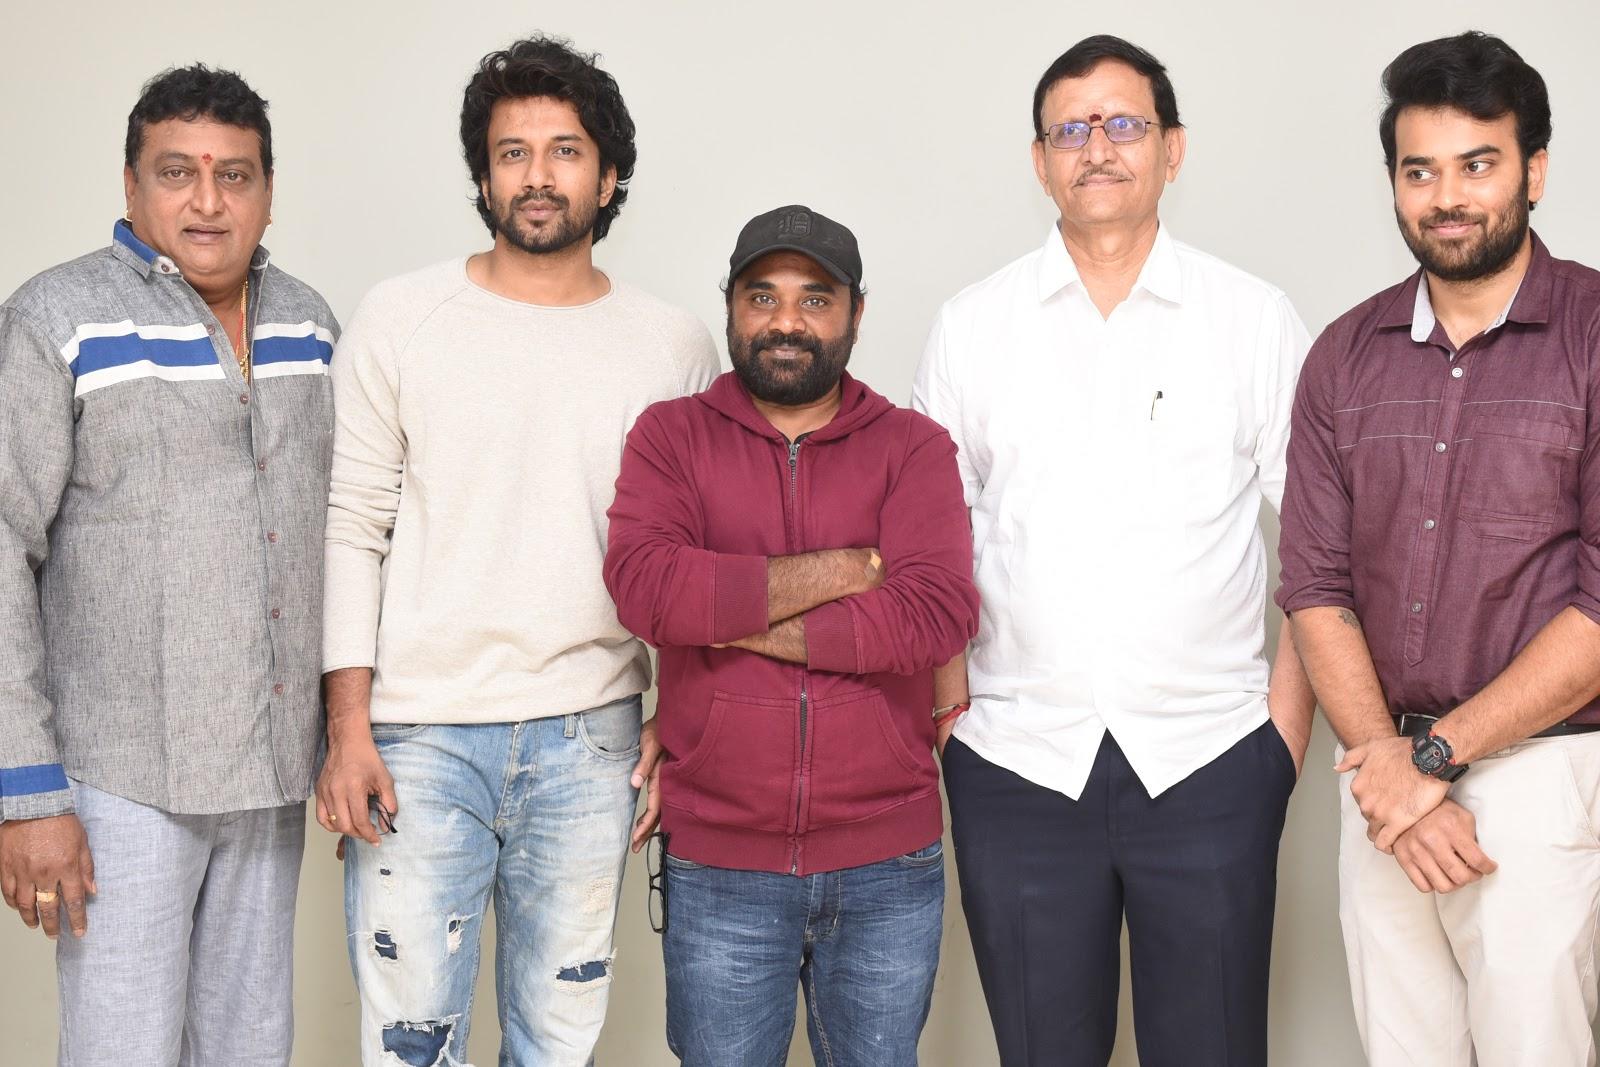 Prudhvi Raj, Satya Dev, Gopi Ganesh, Shivalan Krishna Prasad, Krishna Chaitanya @ Bluff Master Movie Trailer Launch Stills